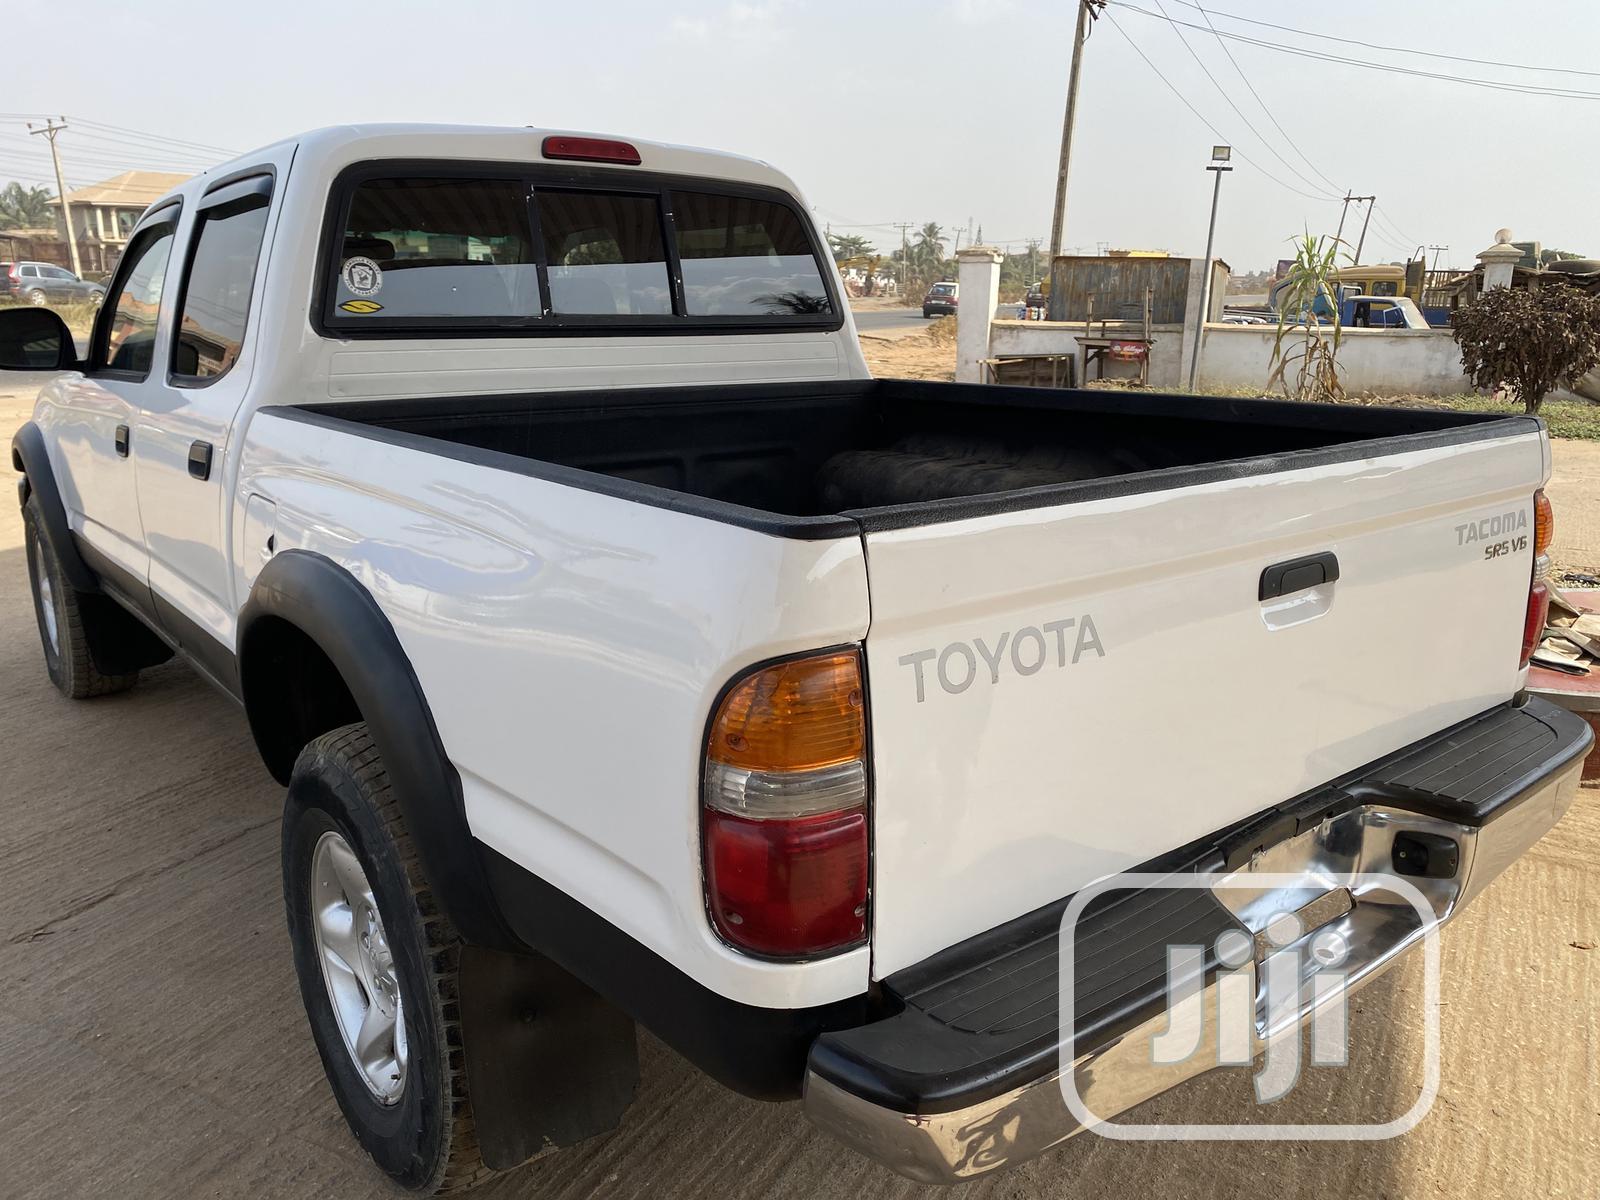 Archive: Toyota Tacoma 2001 White